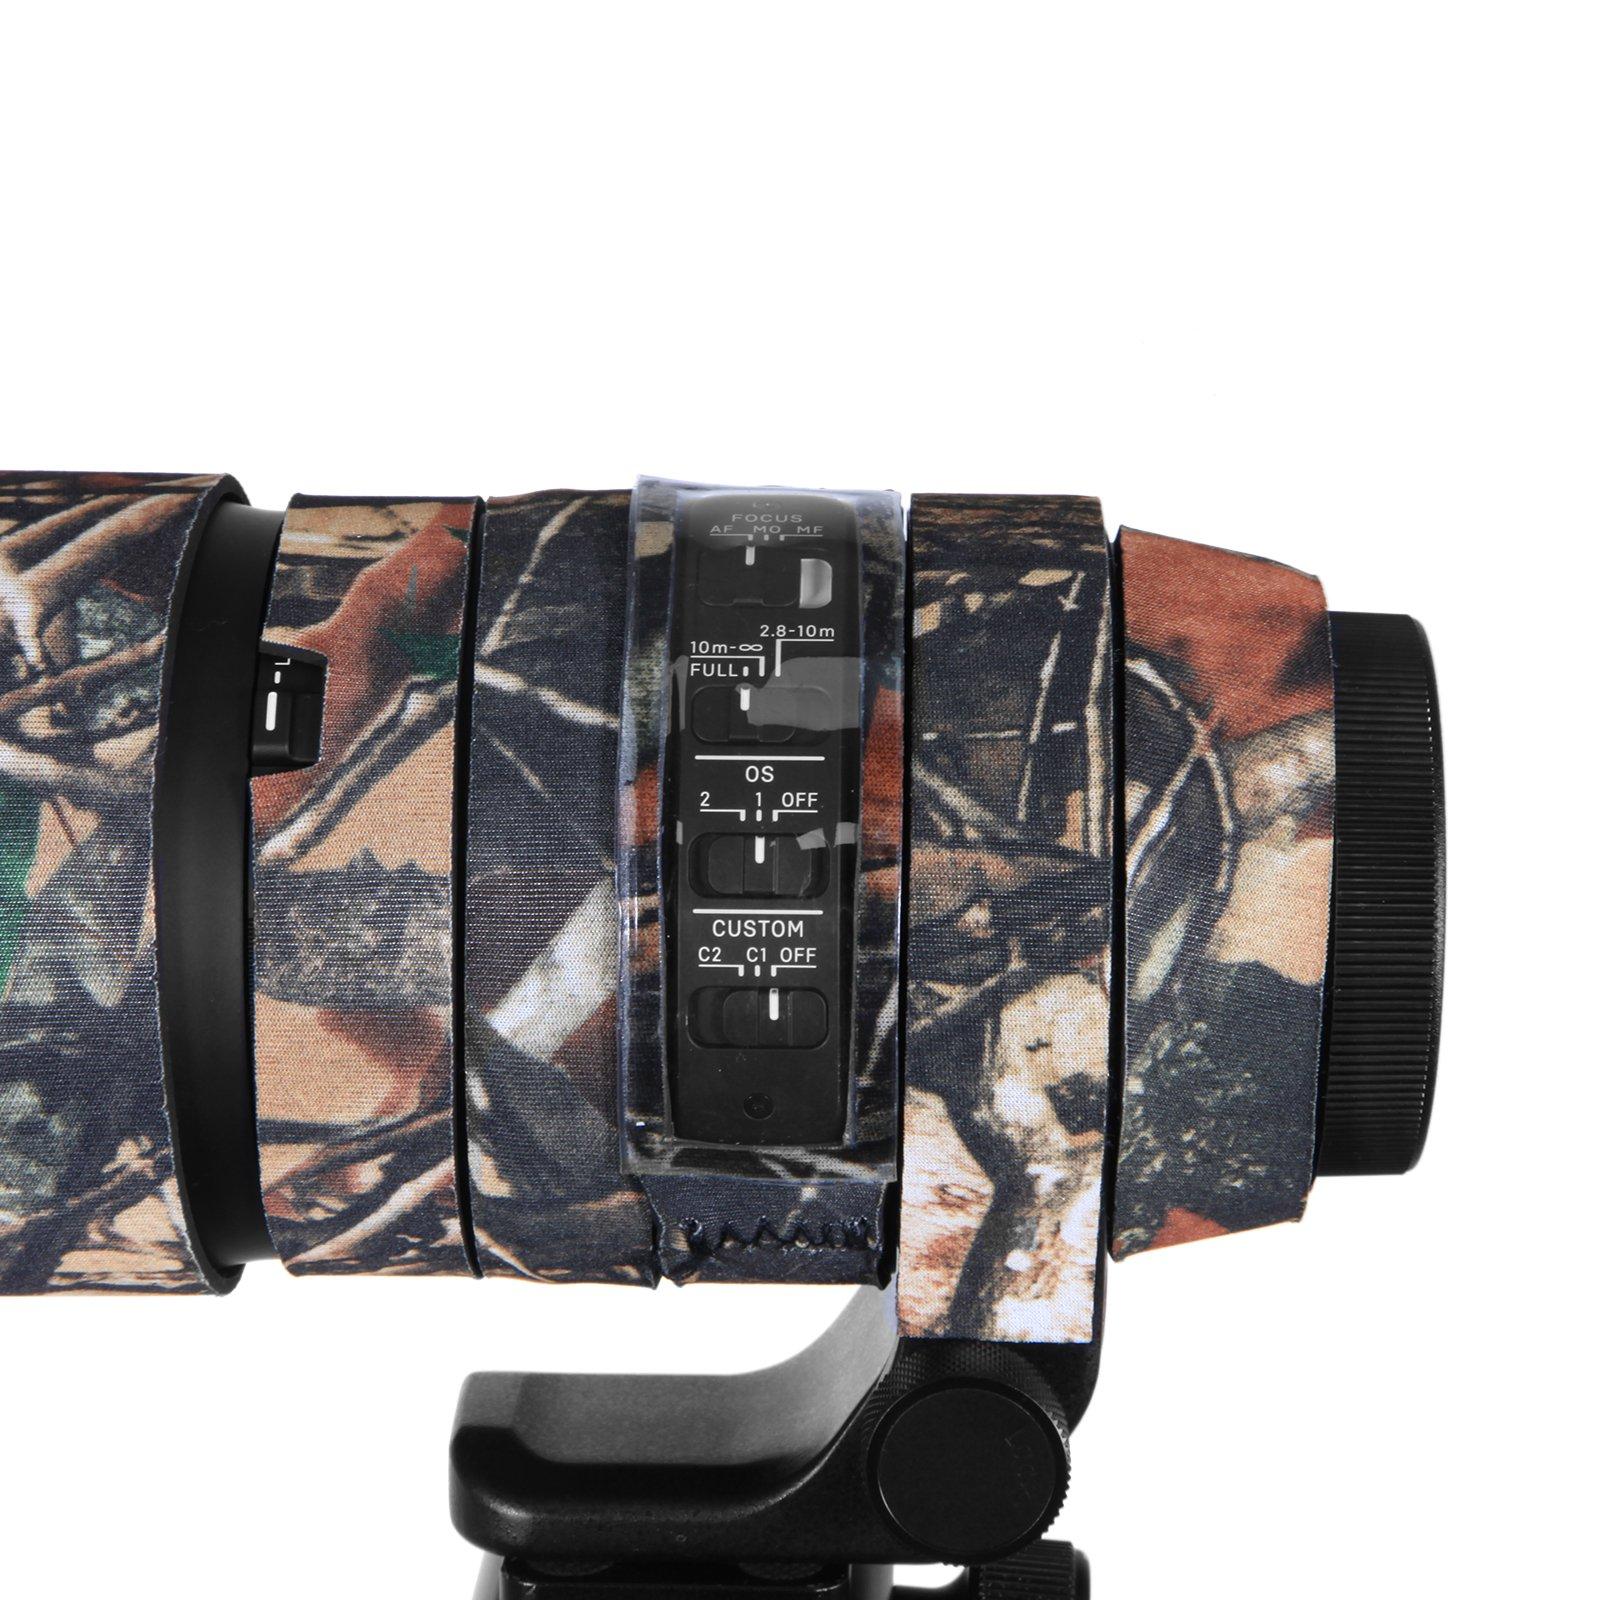 Mekingstudio Camera Lens Cover Protective for Sigma 150-600mm C - Forest Green Camo by Mekingstudio (Image #3)